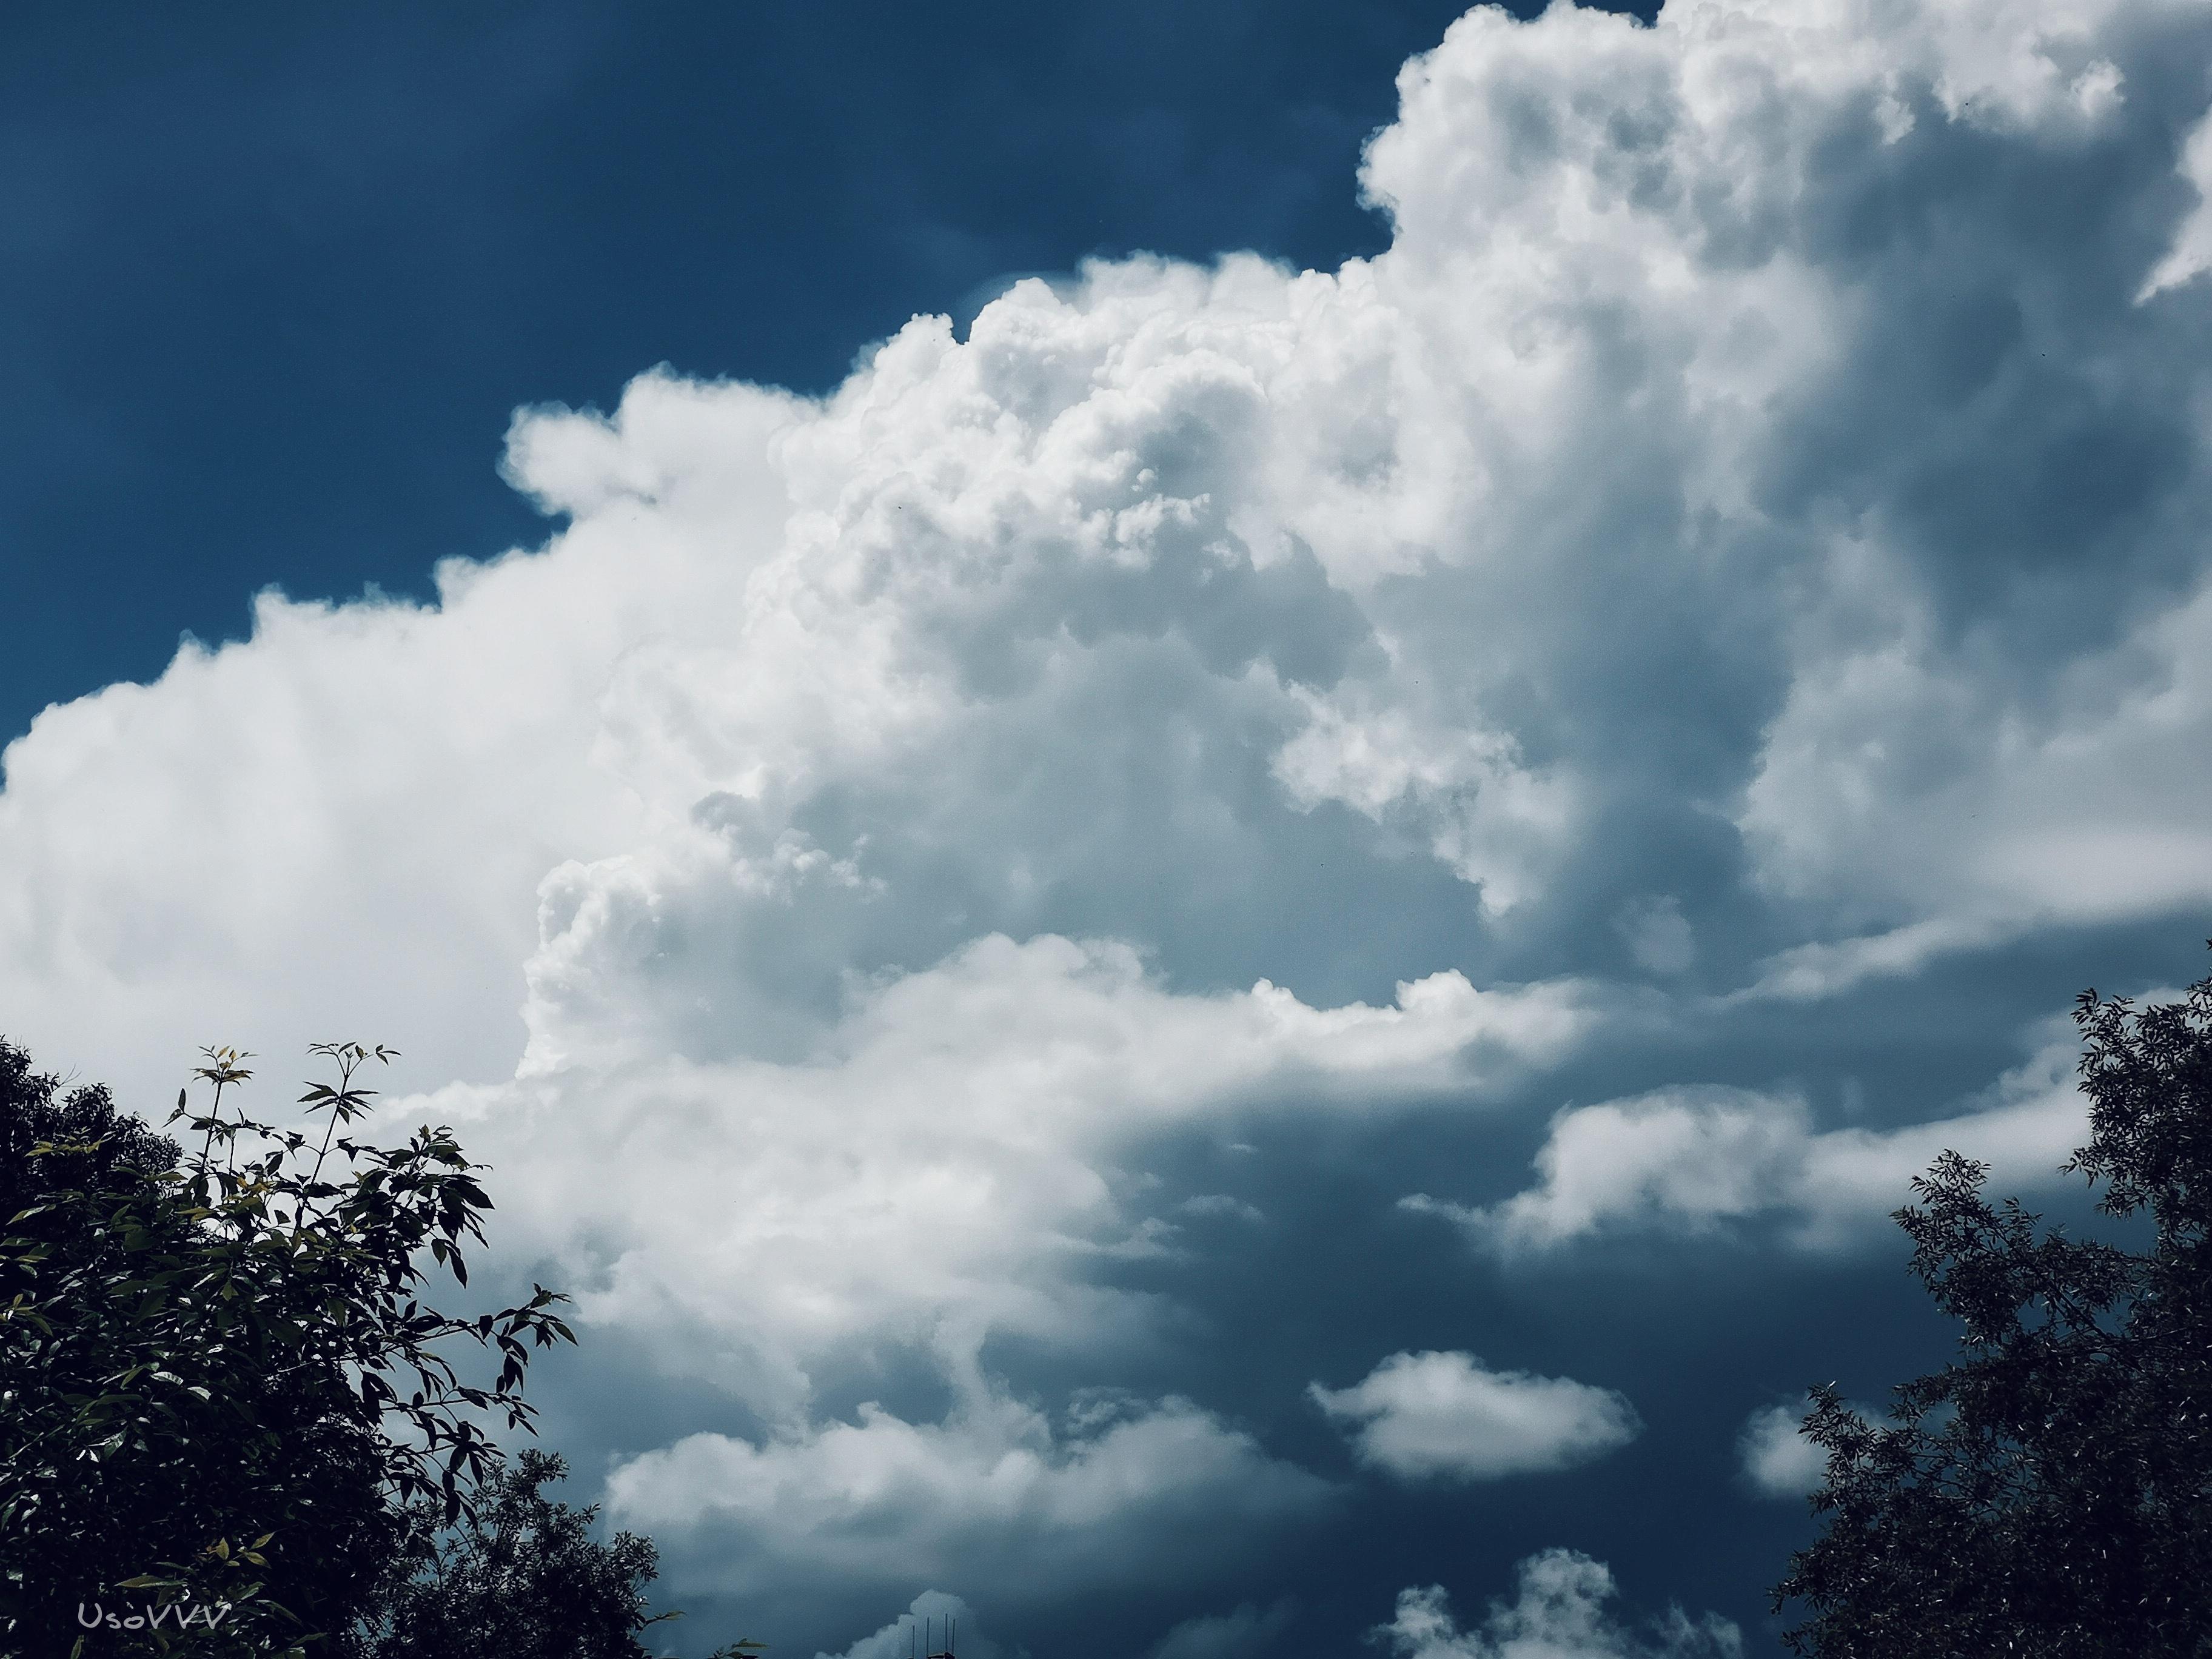 Gambar Awan Awan Pegunungan Langit Tengah Hari Dunia